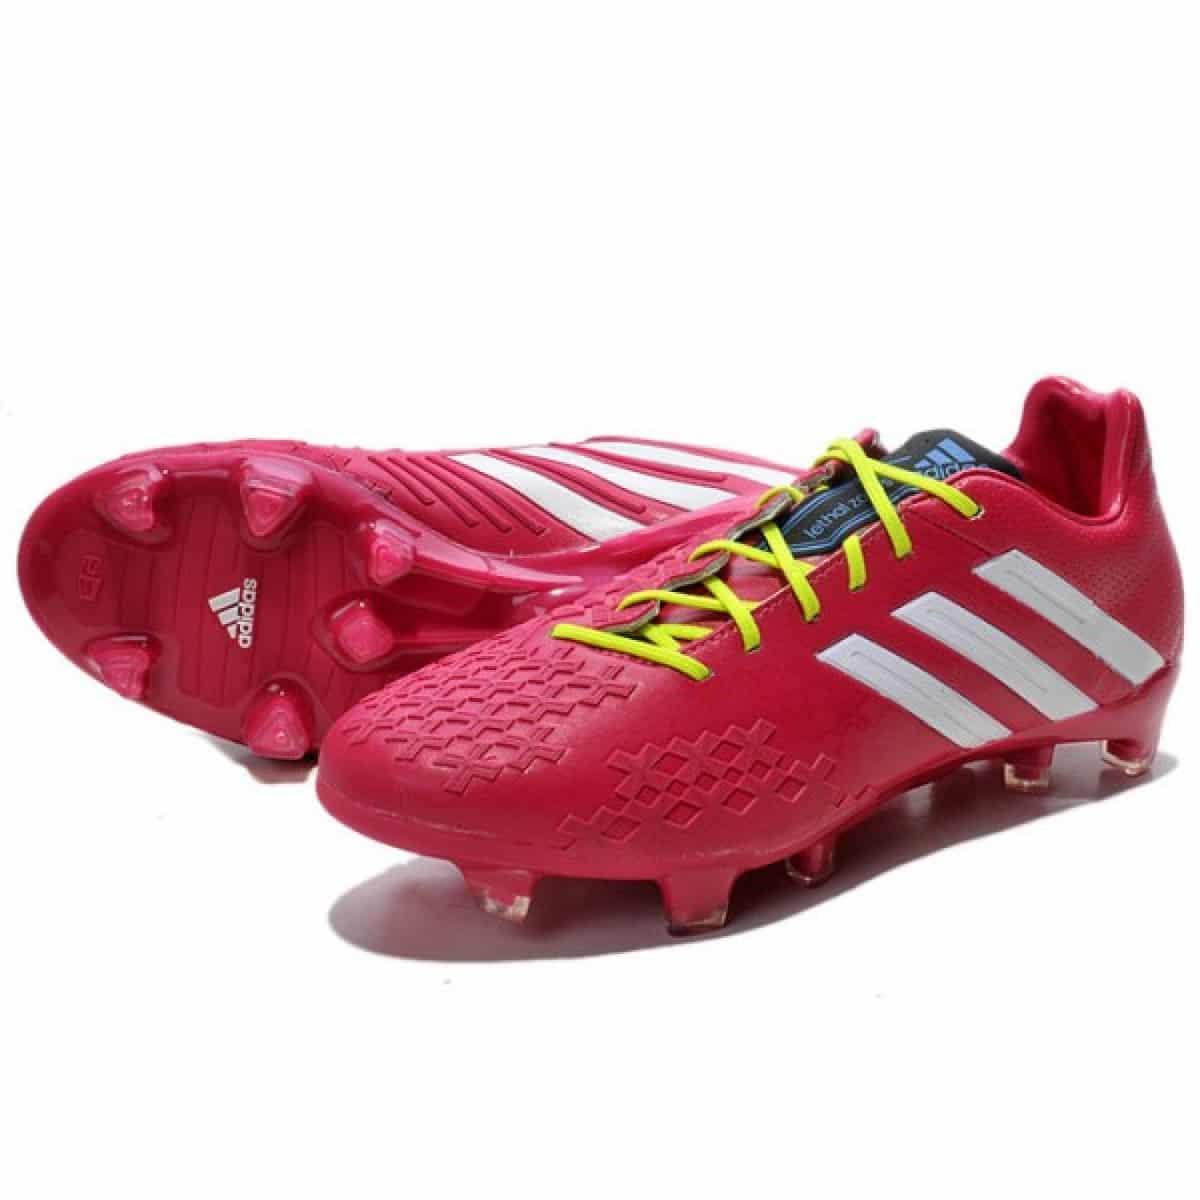 chaussures-football-samba-pack-2014-adidas-predator-lz-trx-rose